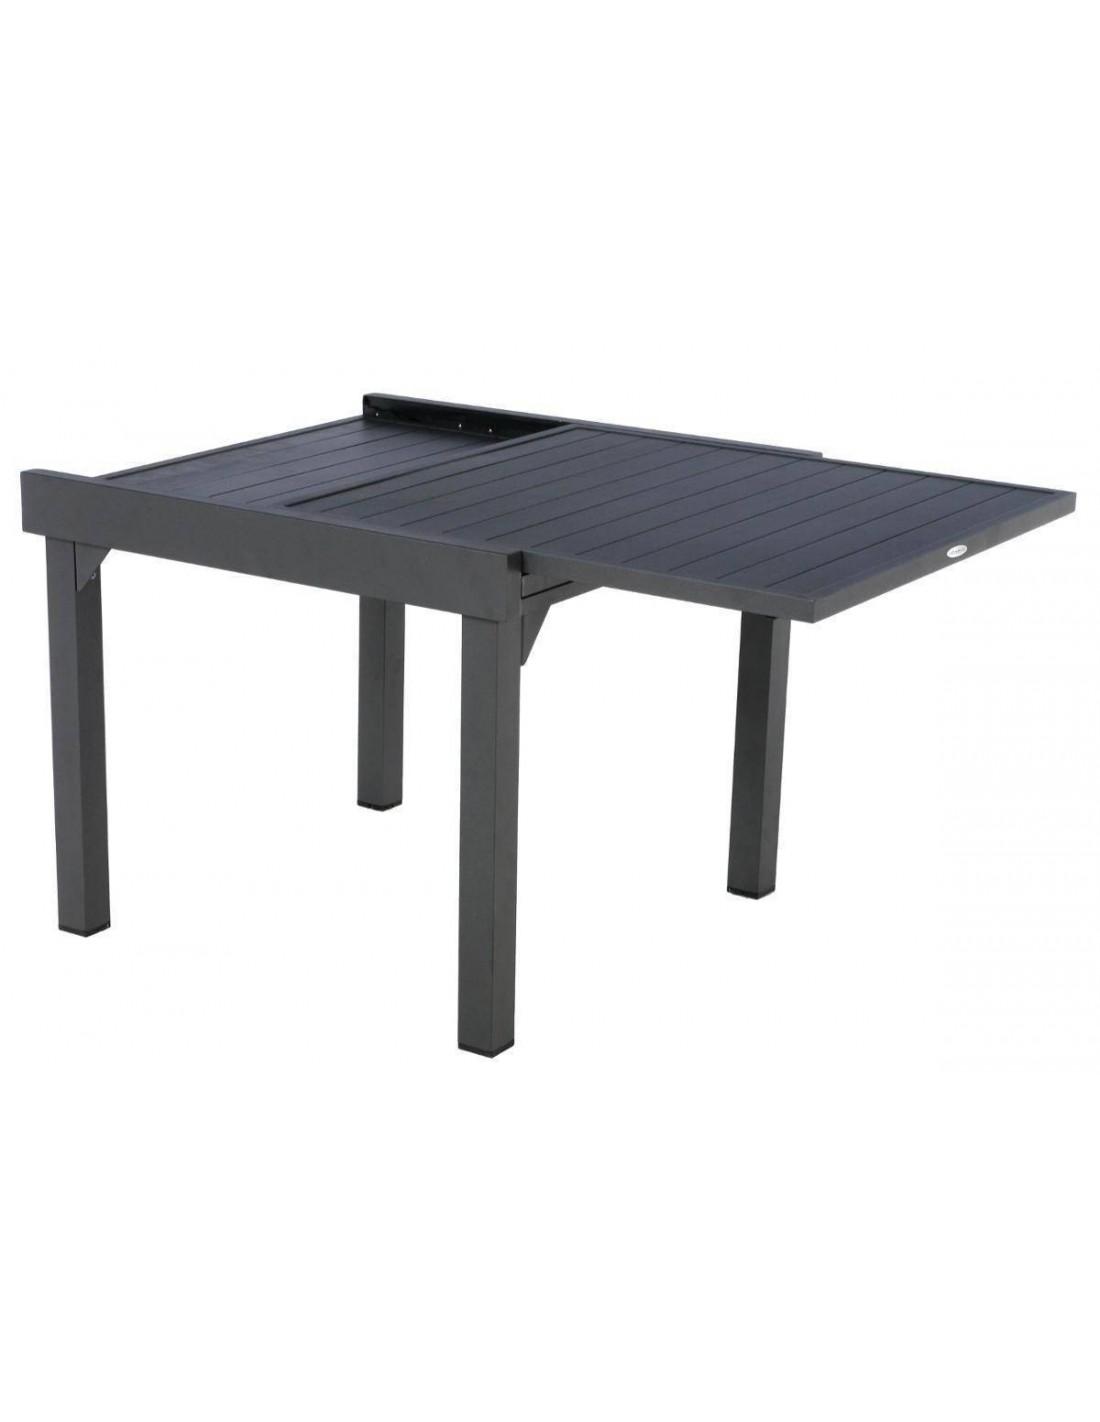 Table de jardin Piazza extensible 90/180 cm en Aluminium - Hespéride